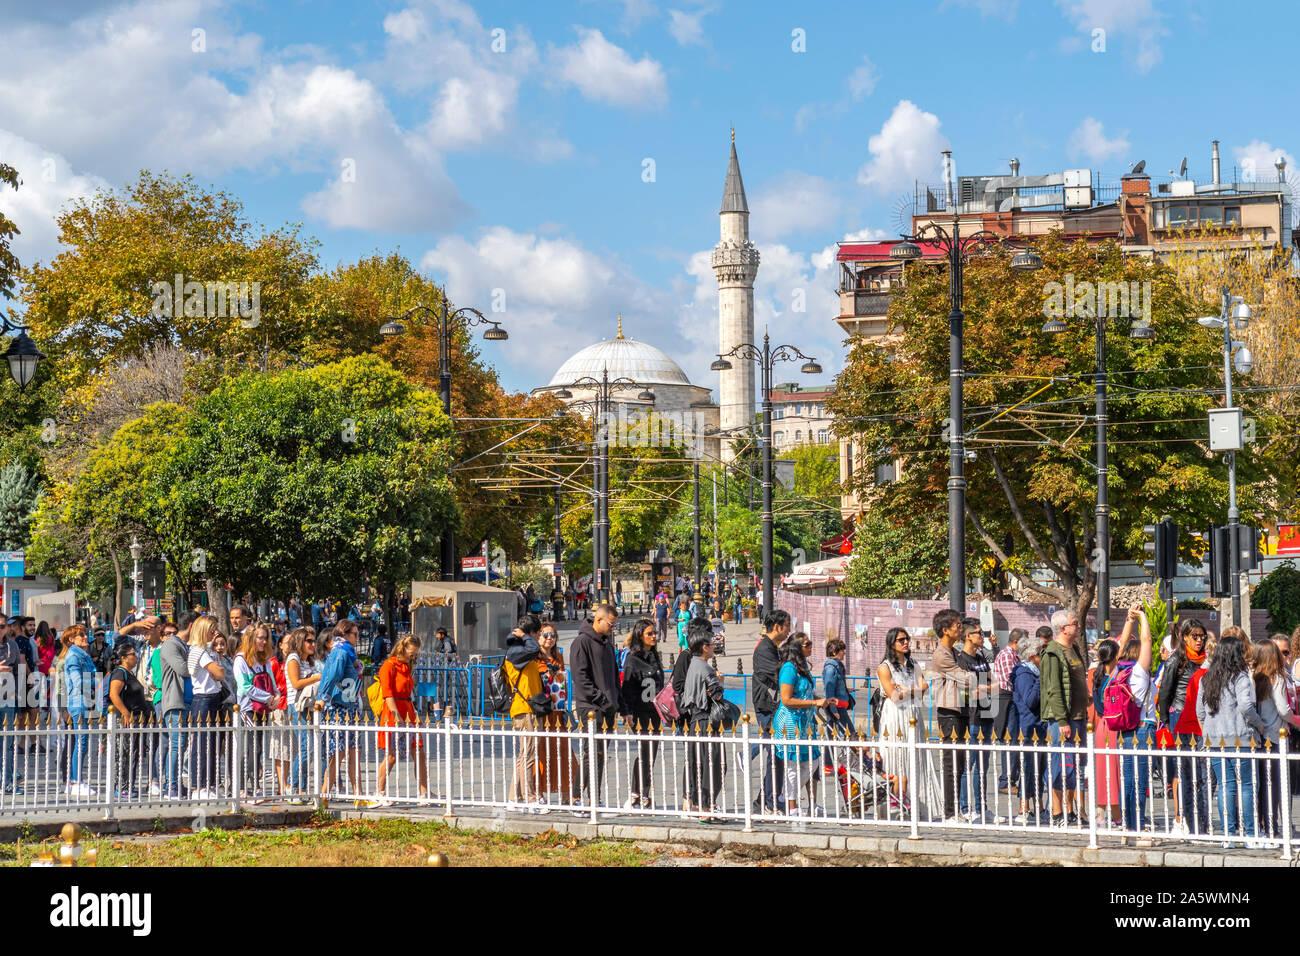 Visitors line up to visit the Hagia Sophia museum in Sultanahmet Square in Istanbul, Turkey Stock Photo